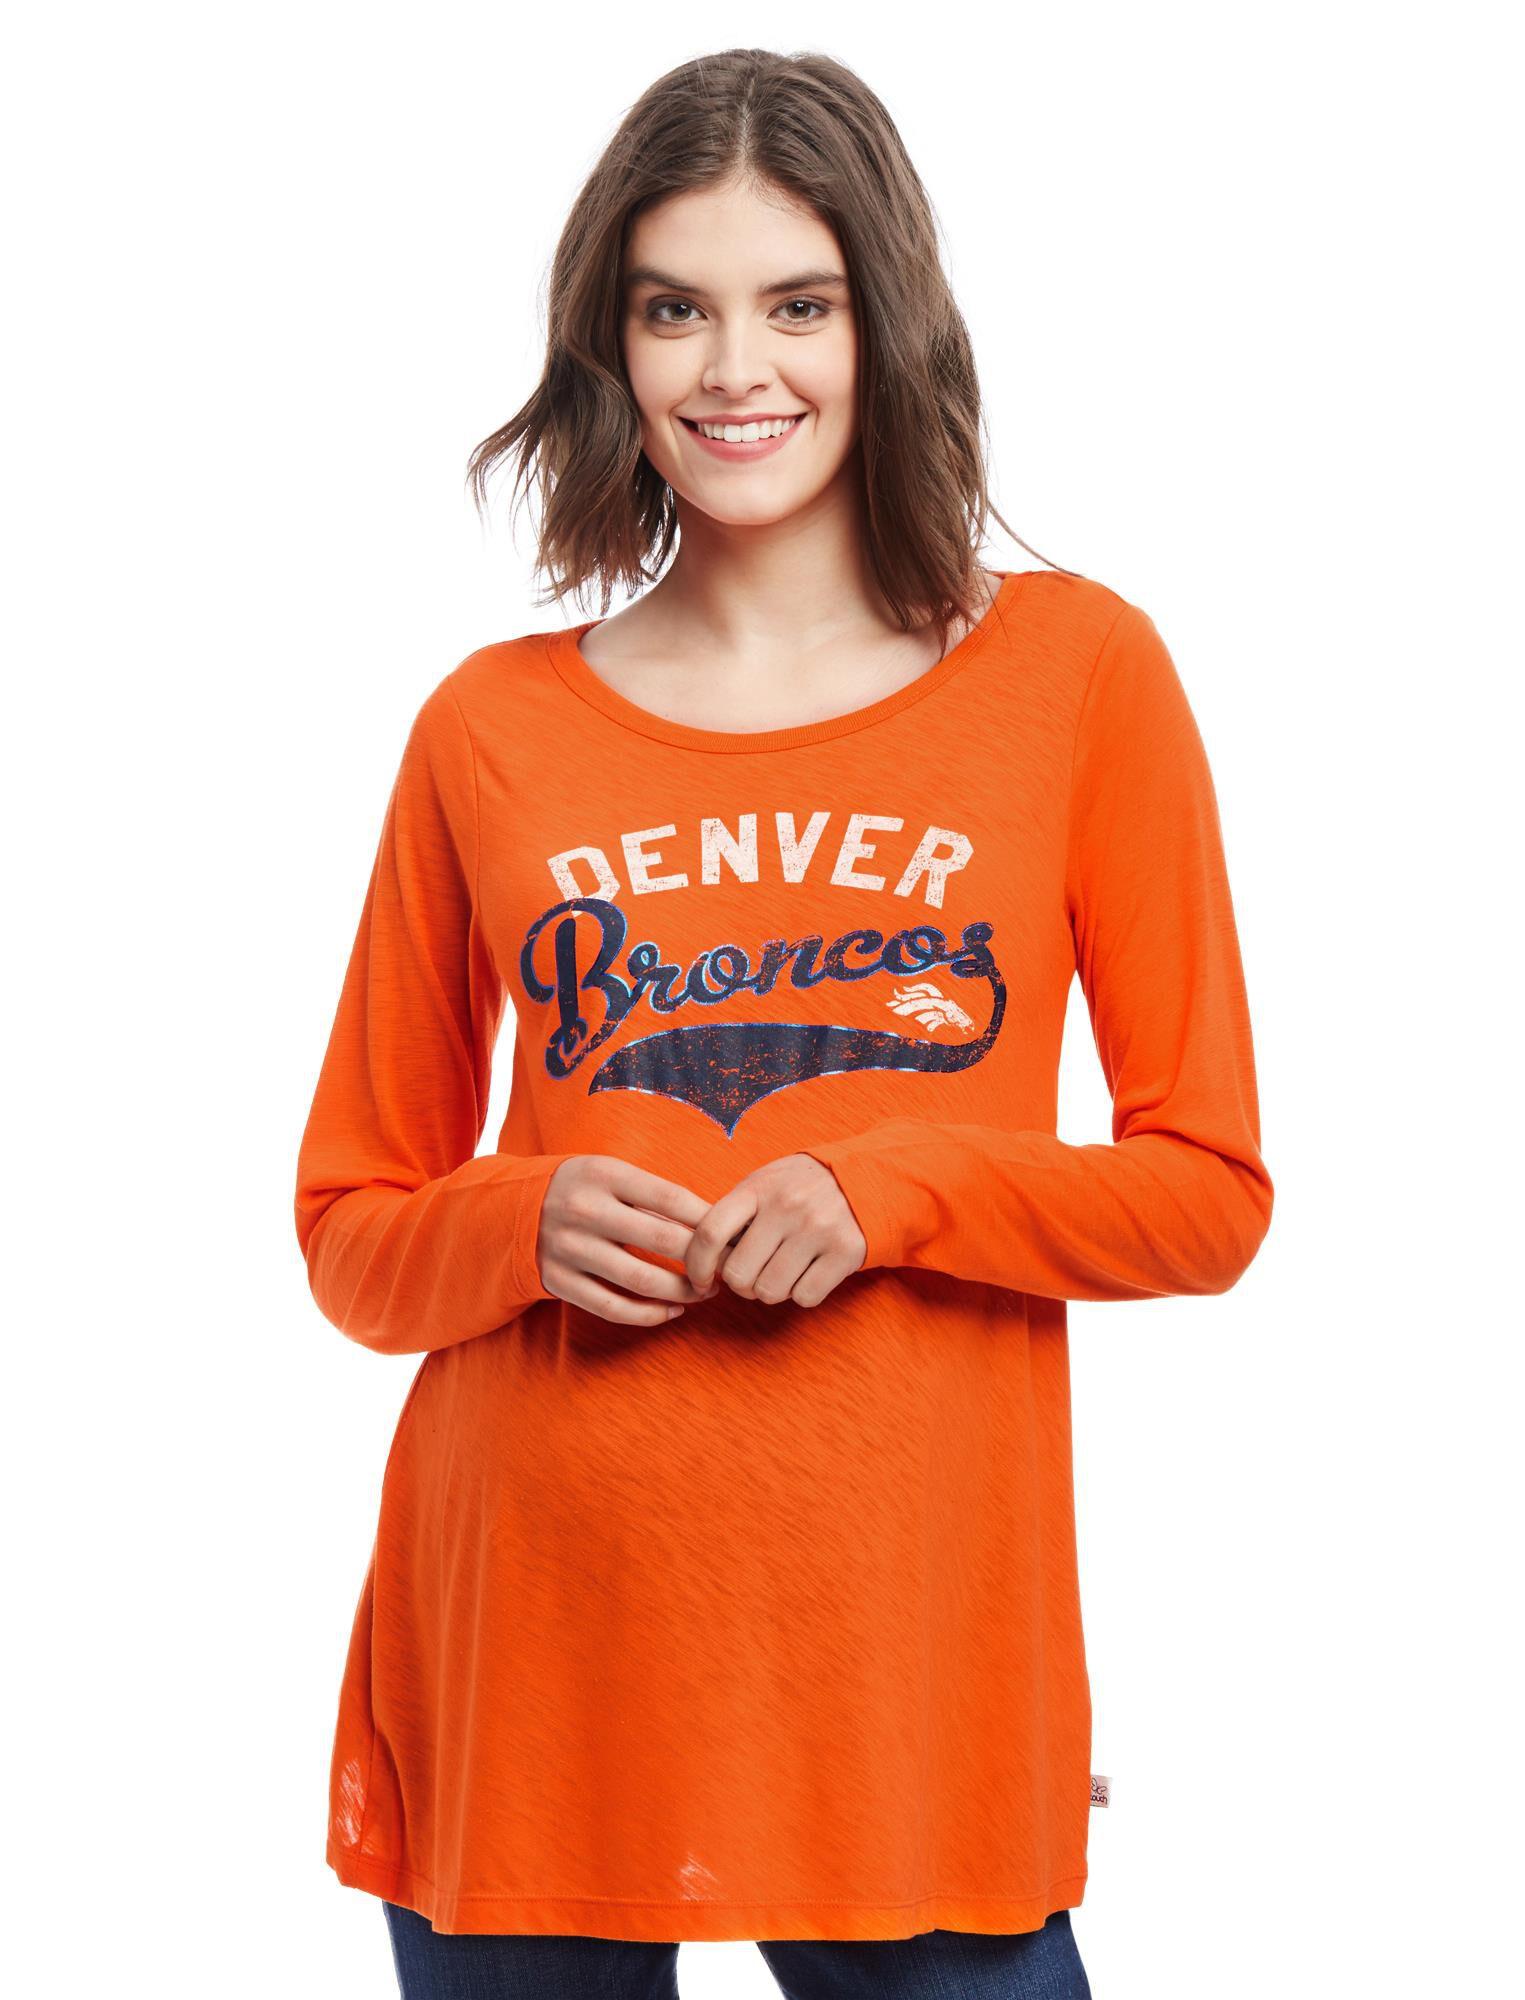 Denver Broncos NFL Long Sleeve Maternity Graphic Tee